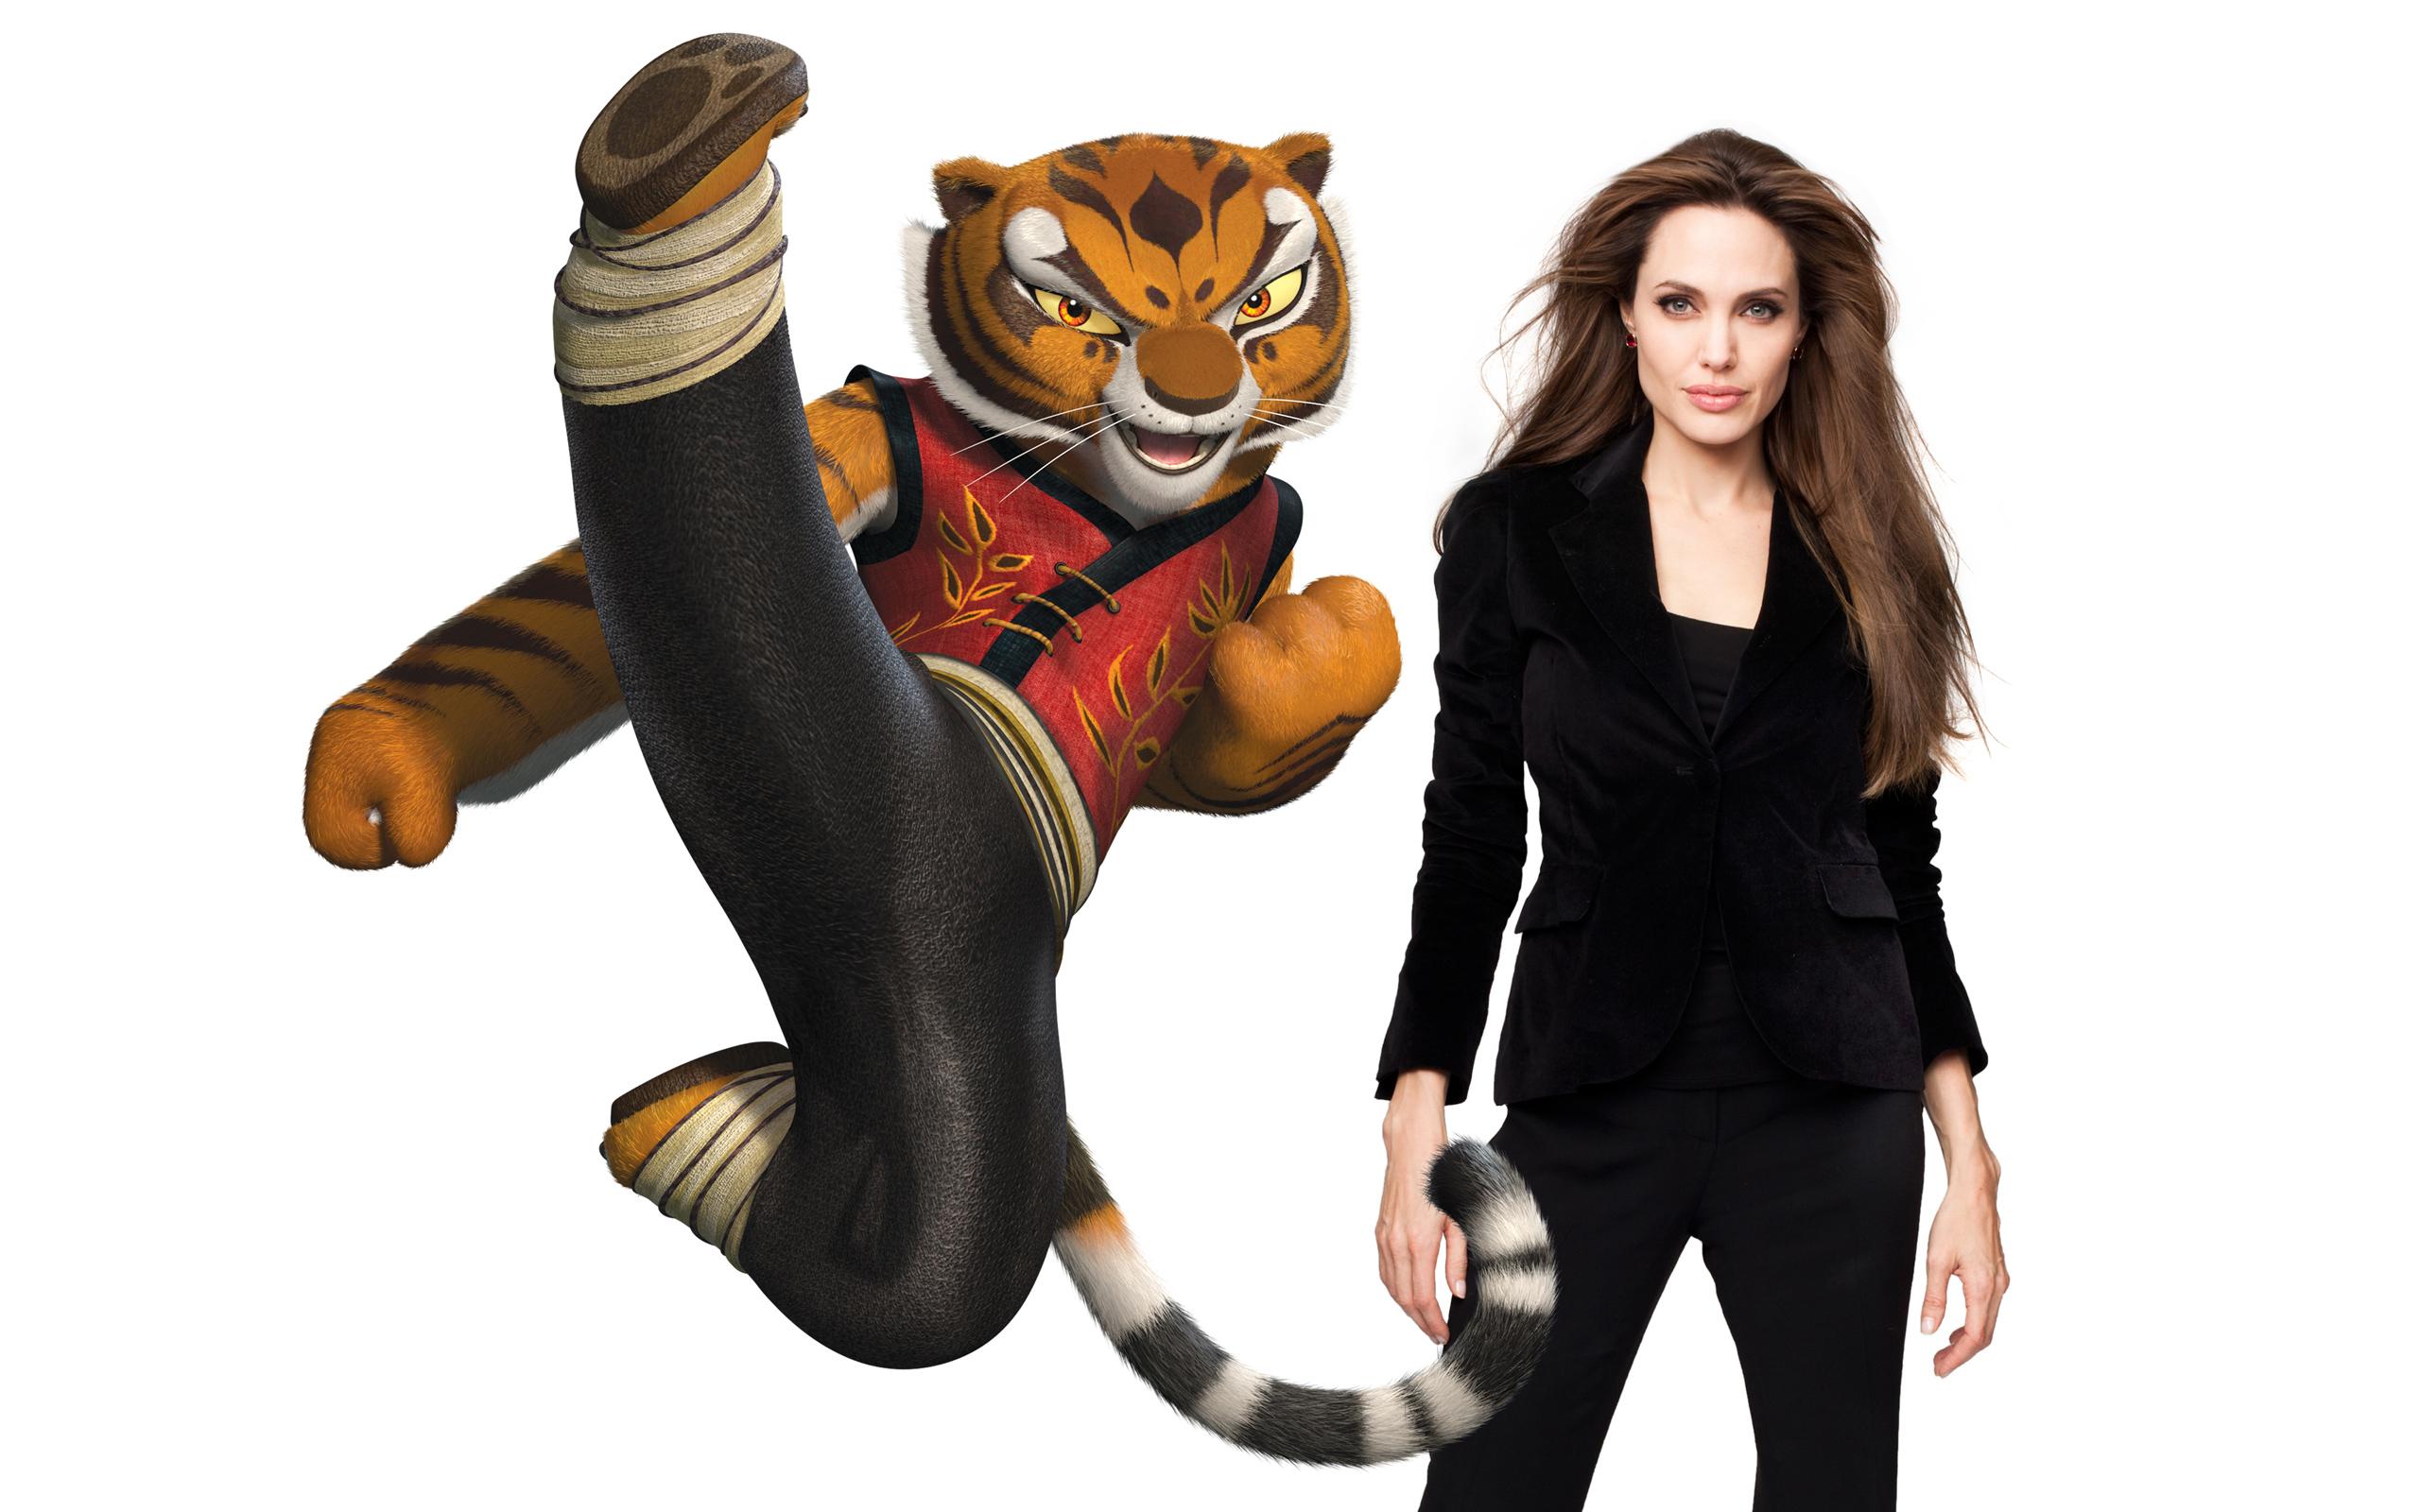 Angelina Jolie As Tigress Hd Wallpaper Hintergrund 2560x1600